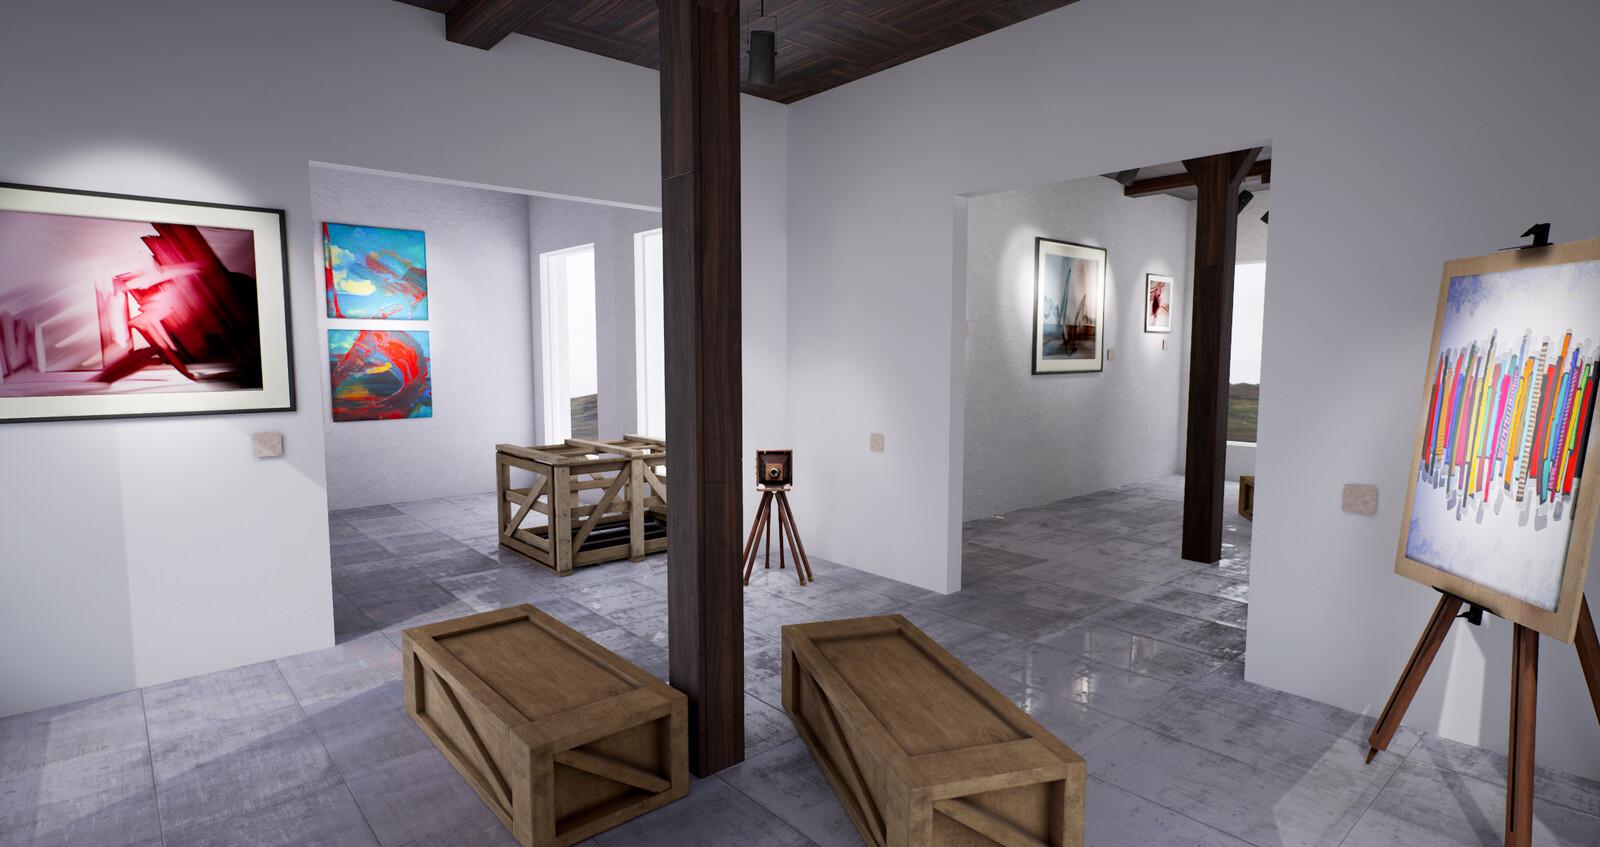 Stormy Portside Gallery 3